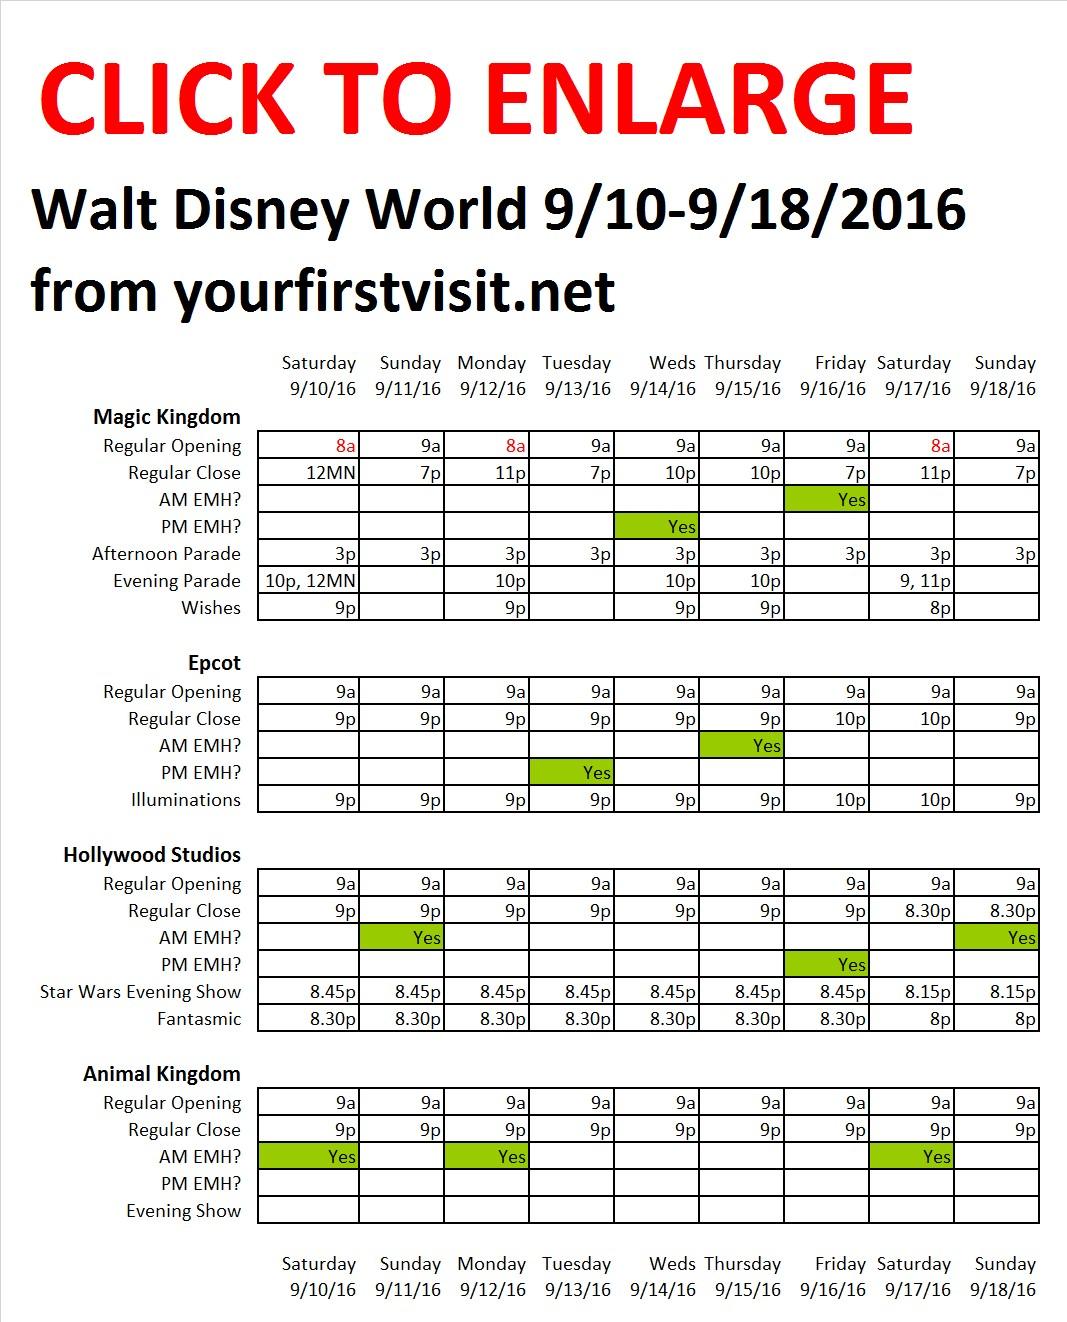 disney-world-9-10-to-9-18-2016-from-yourfirstvisit-net